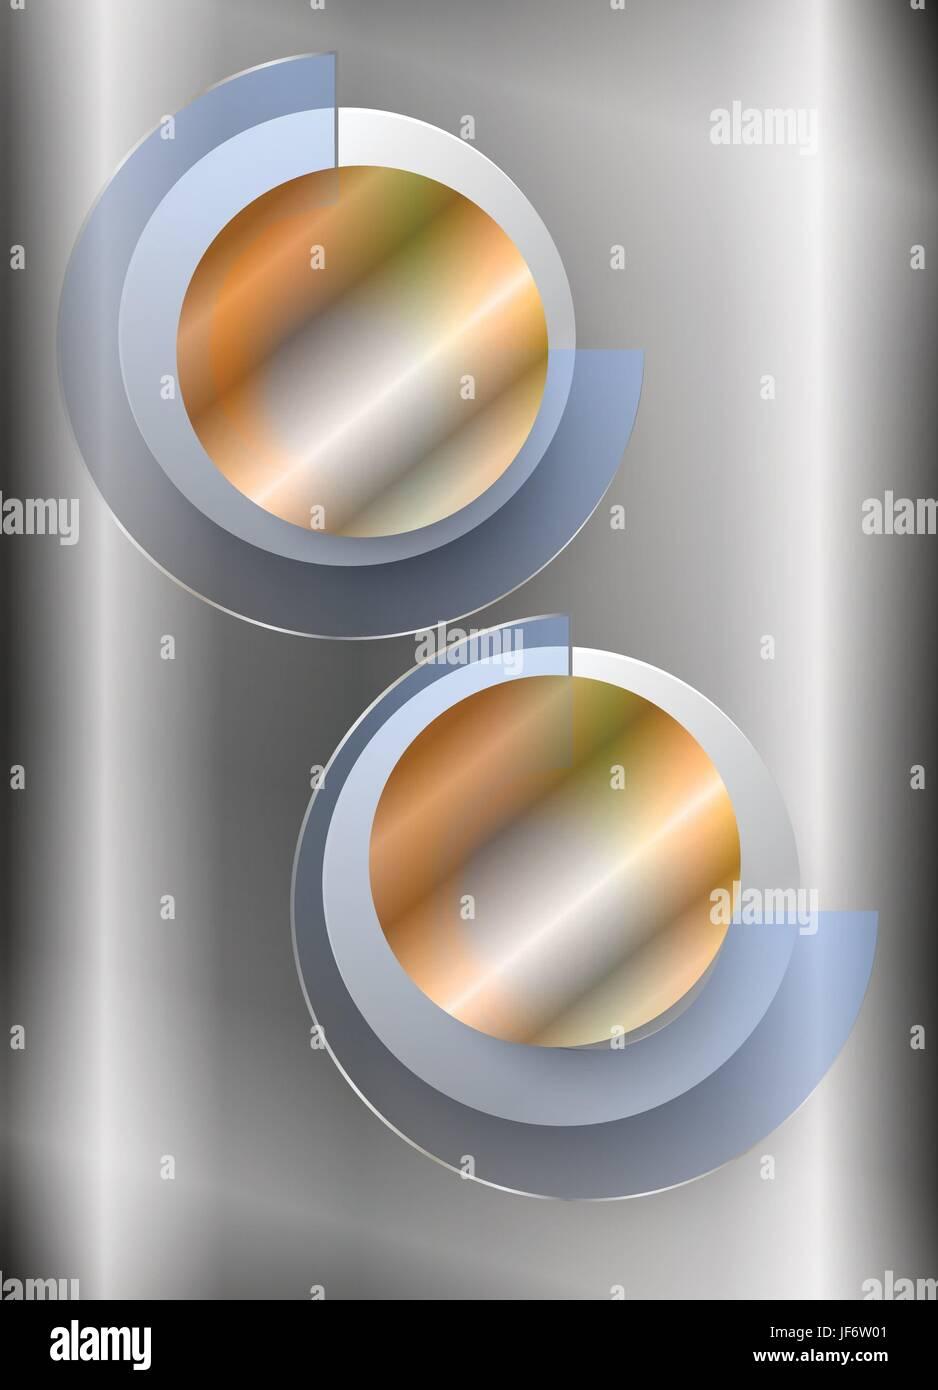 ring, steel, circle, glossy, metallic, shaddow, shadow, gold, ring, steel, - Stock Vector